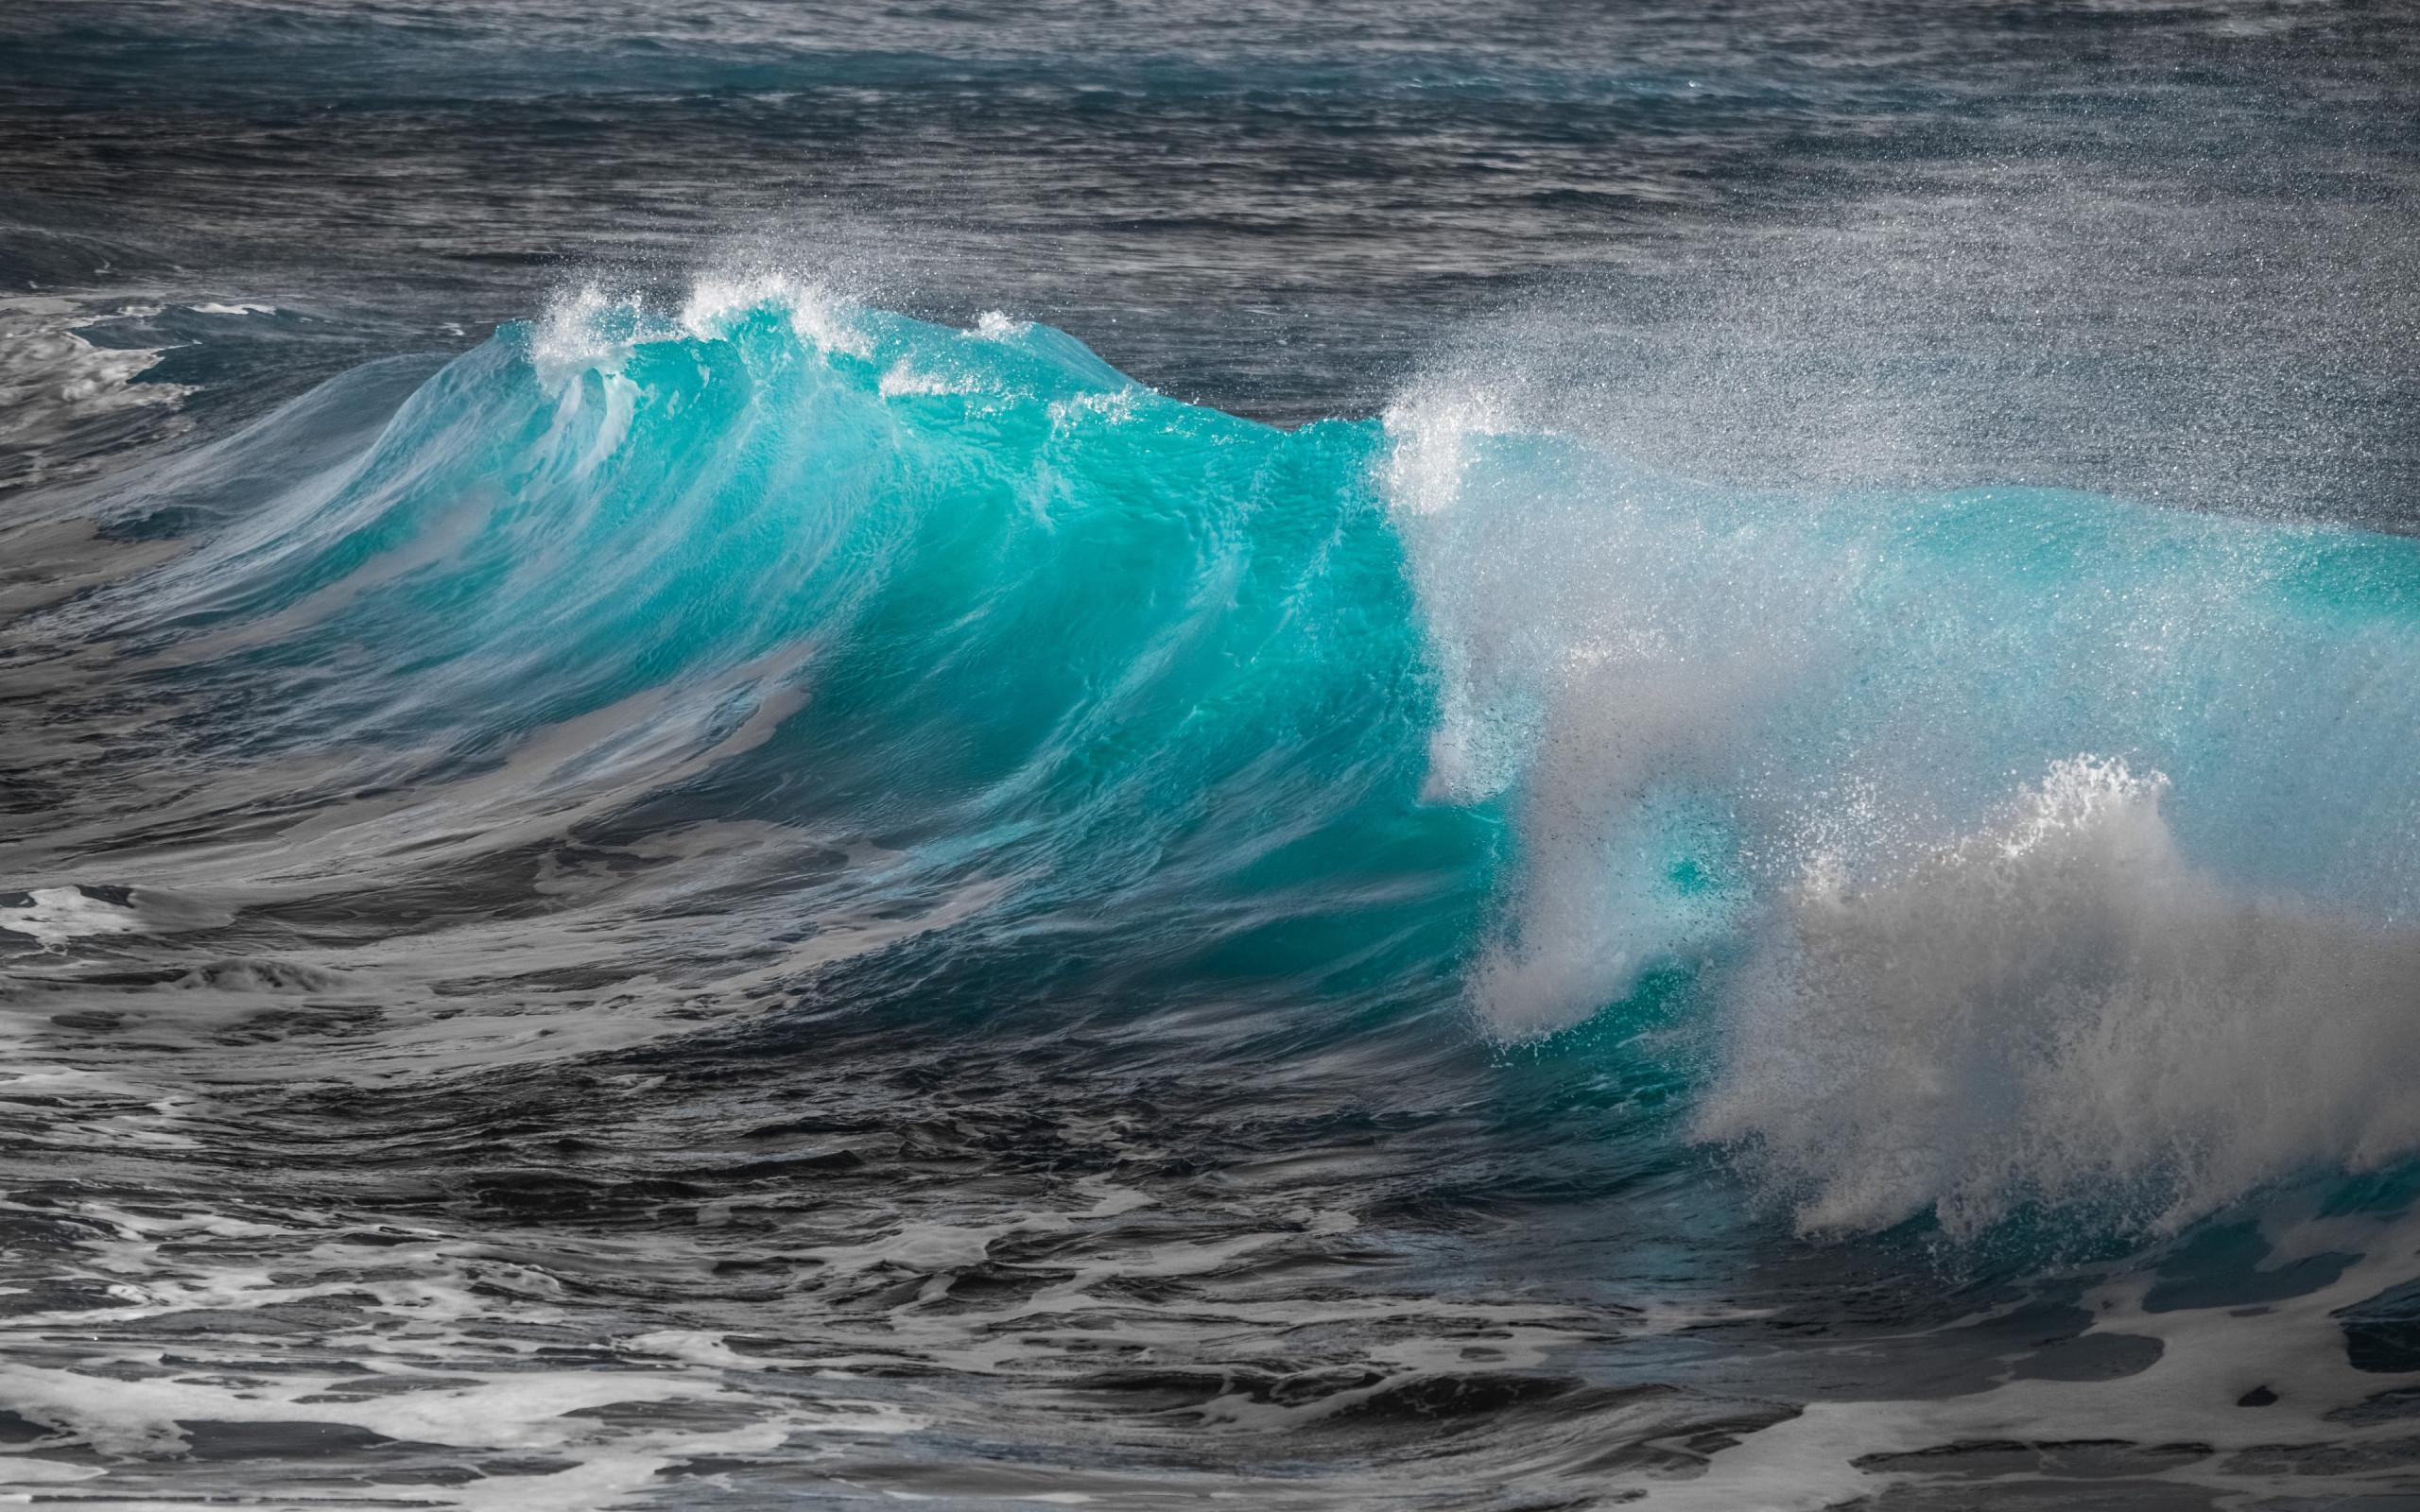 Wallpaper Hd 4k Download Wallpaper Turquoise Sea Wave 2560x1600